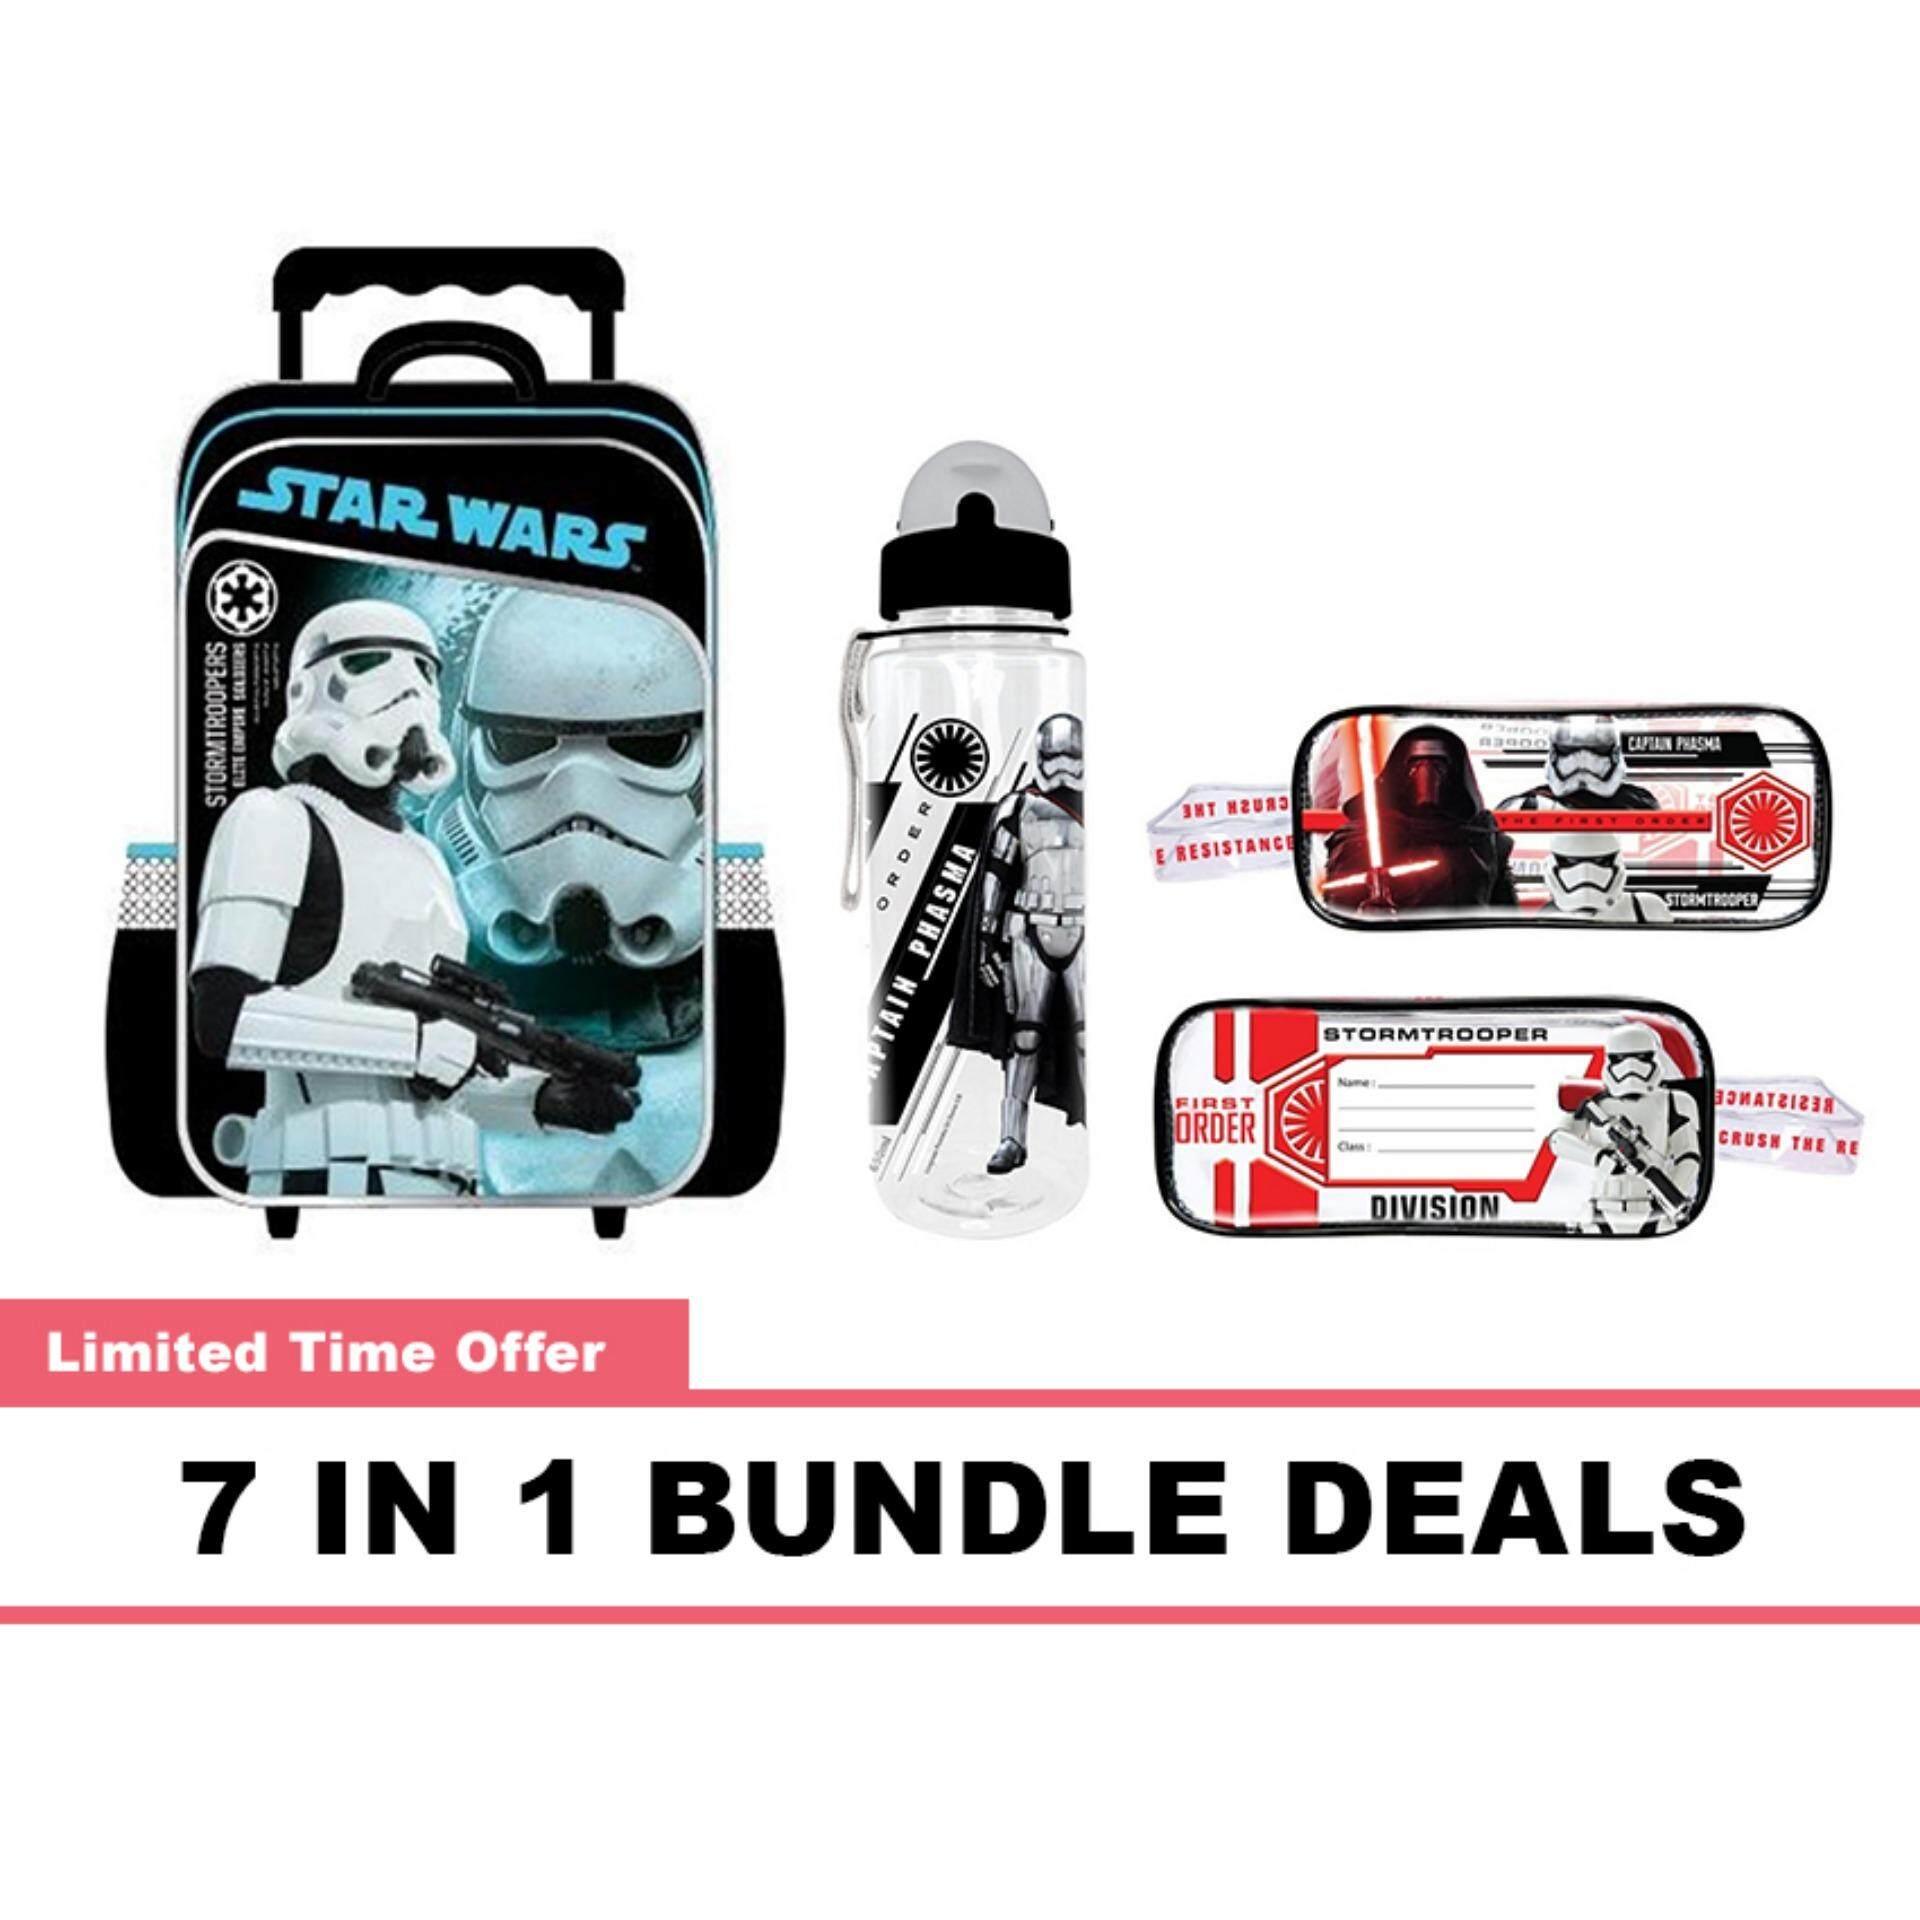 Disney Star Wars Primary School Kids Children School Trolley Bag 650ML BPA Free Water Bottle With Straw Square Pencil Bag Pencil Eraser Ruler & Sharpener 7 In 1 Bundle Deals